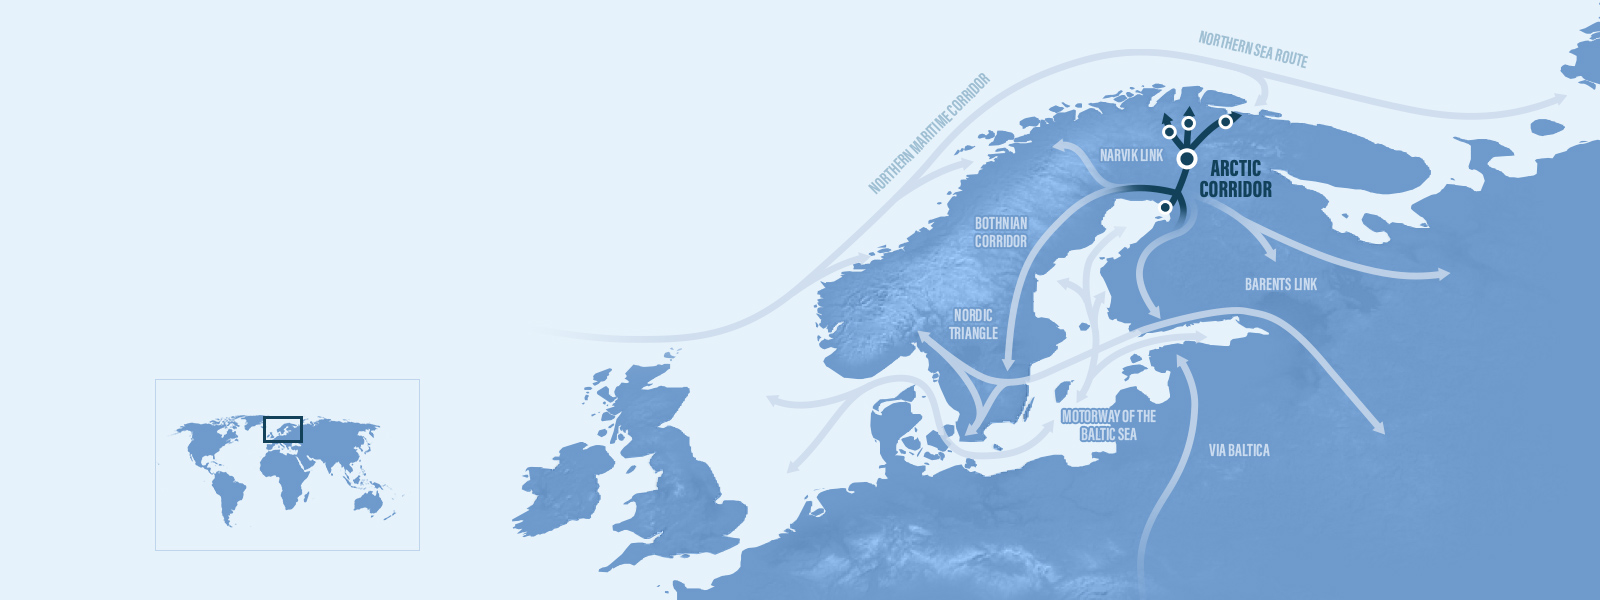 Arctic Corridor